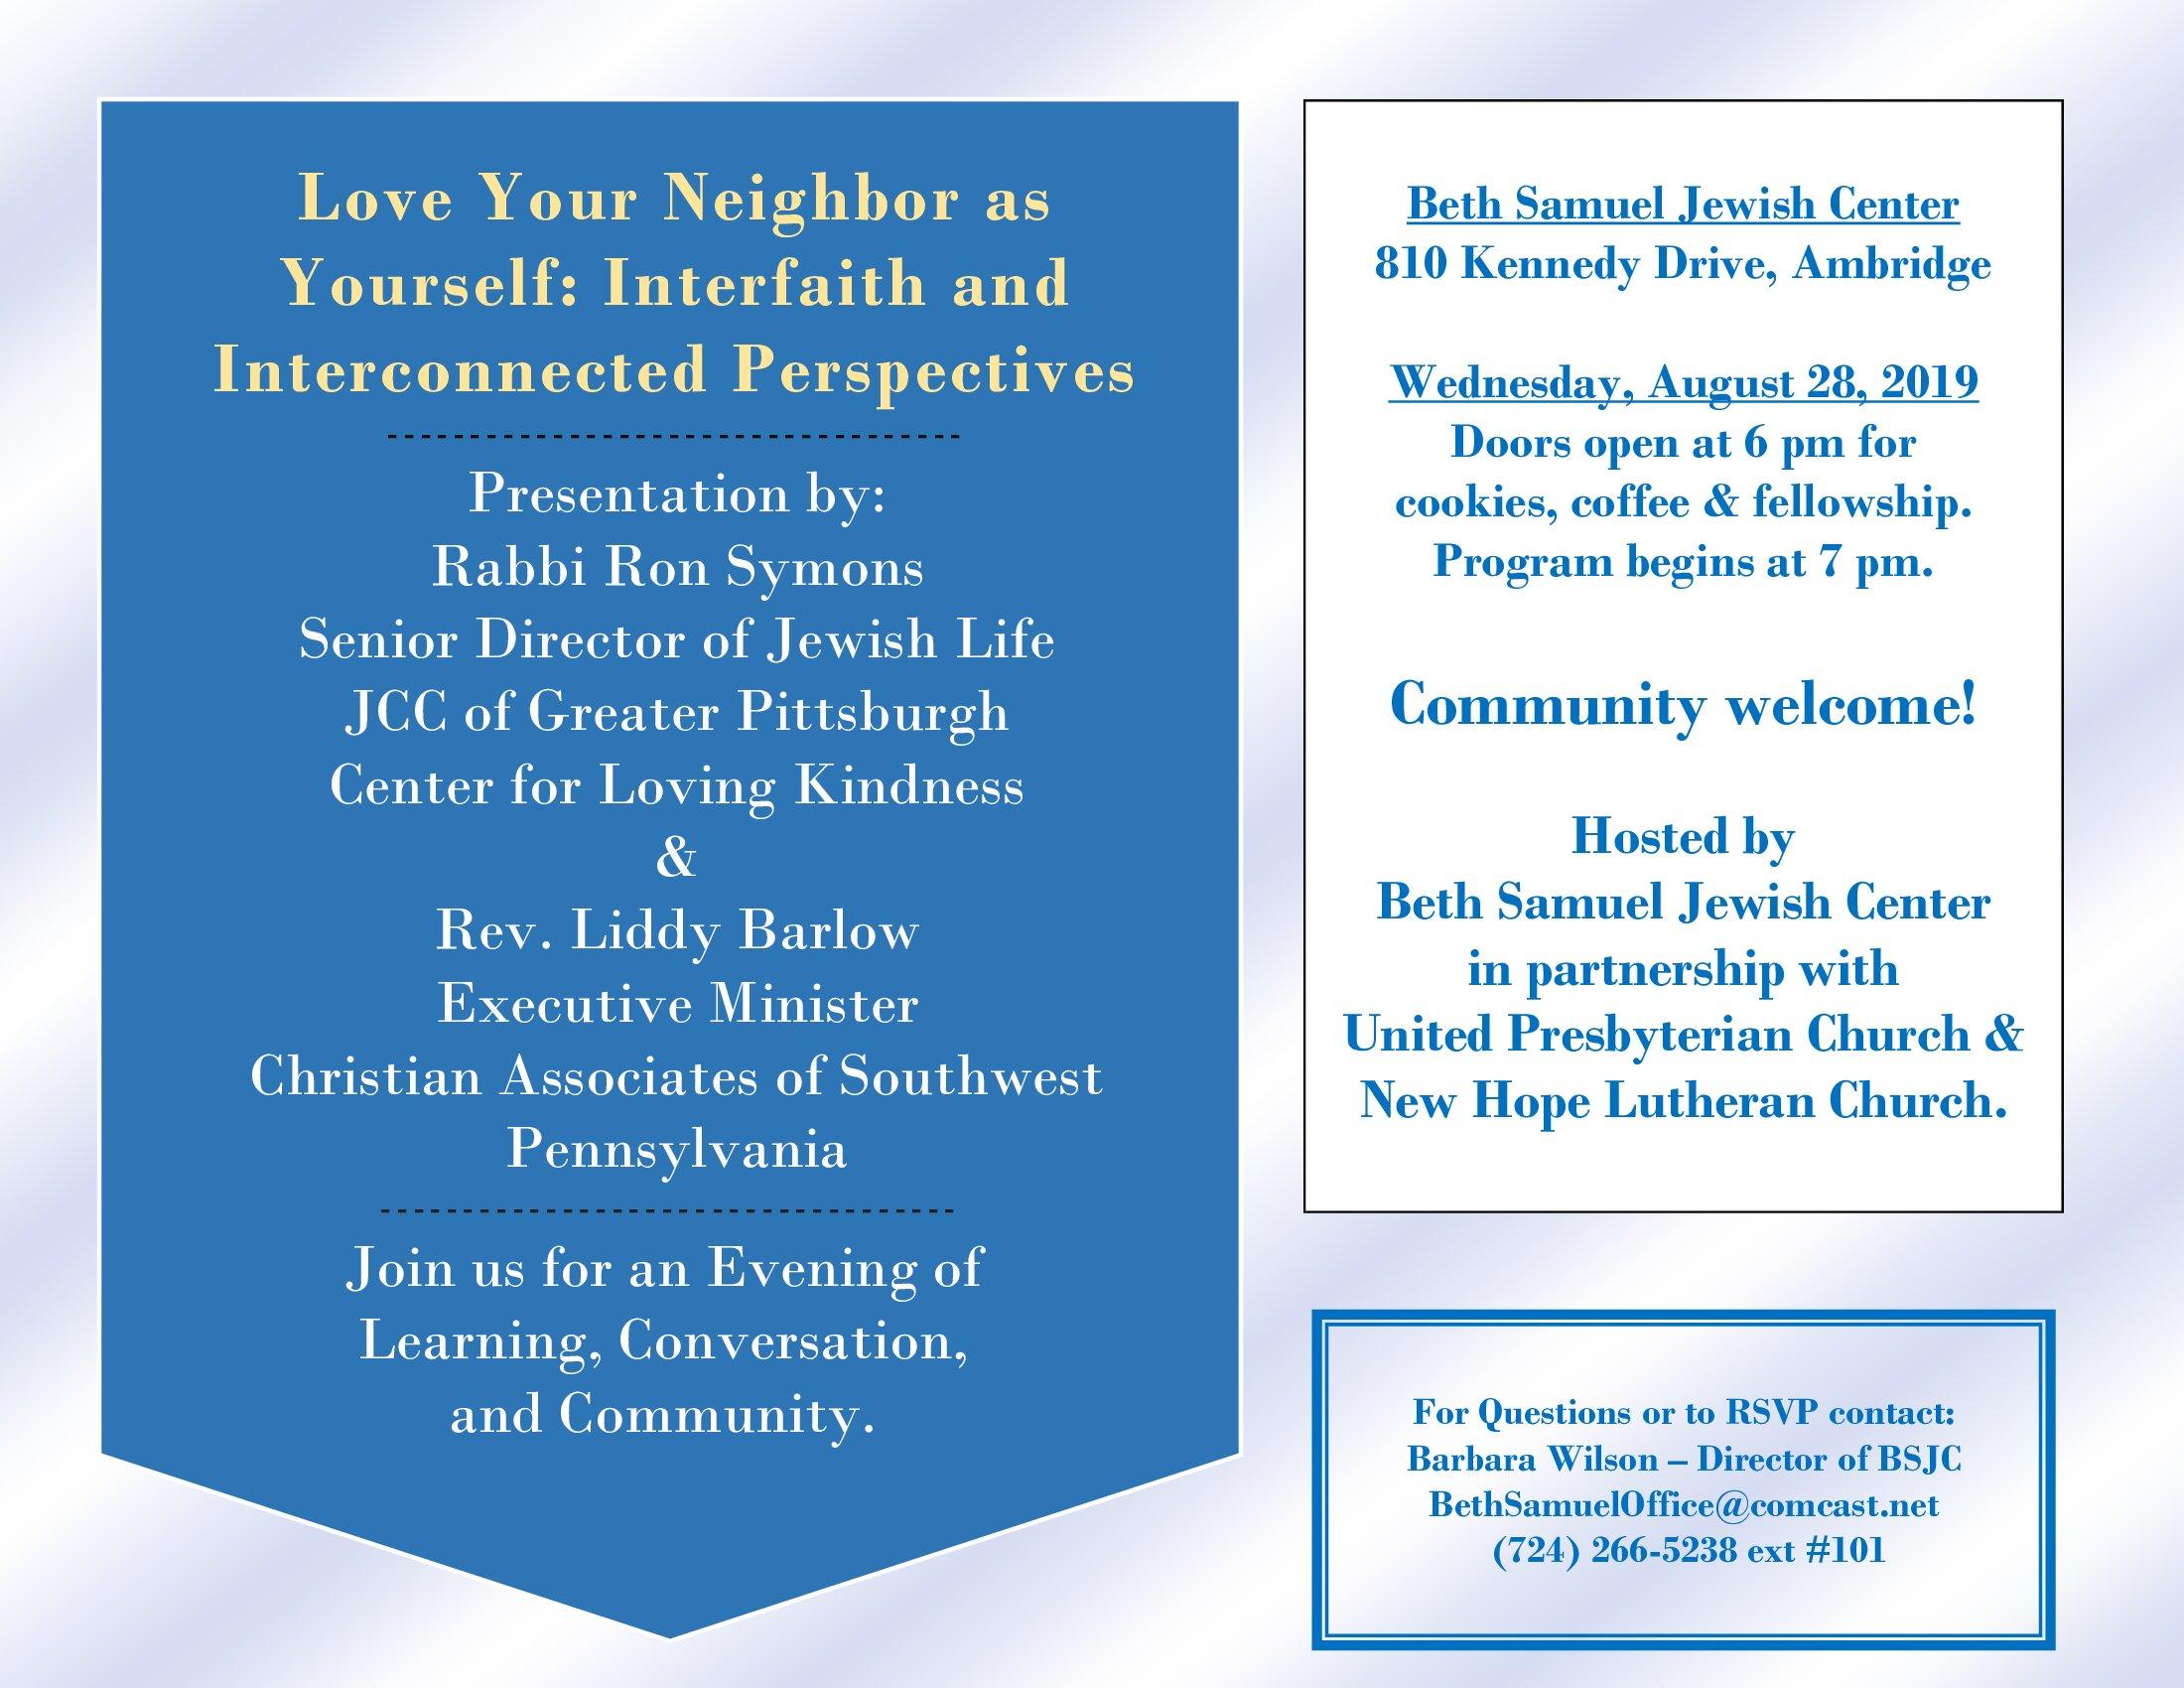 Love_Your_Neighbor_as_Yourself.jpg